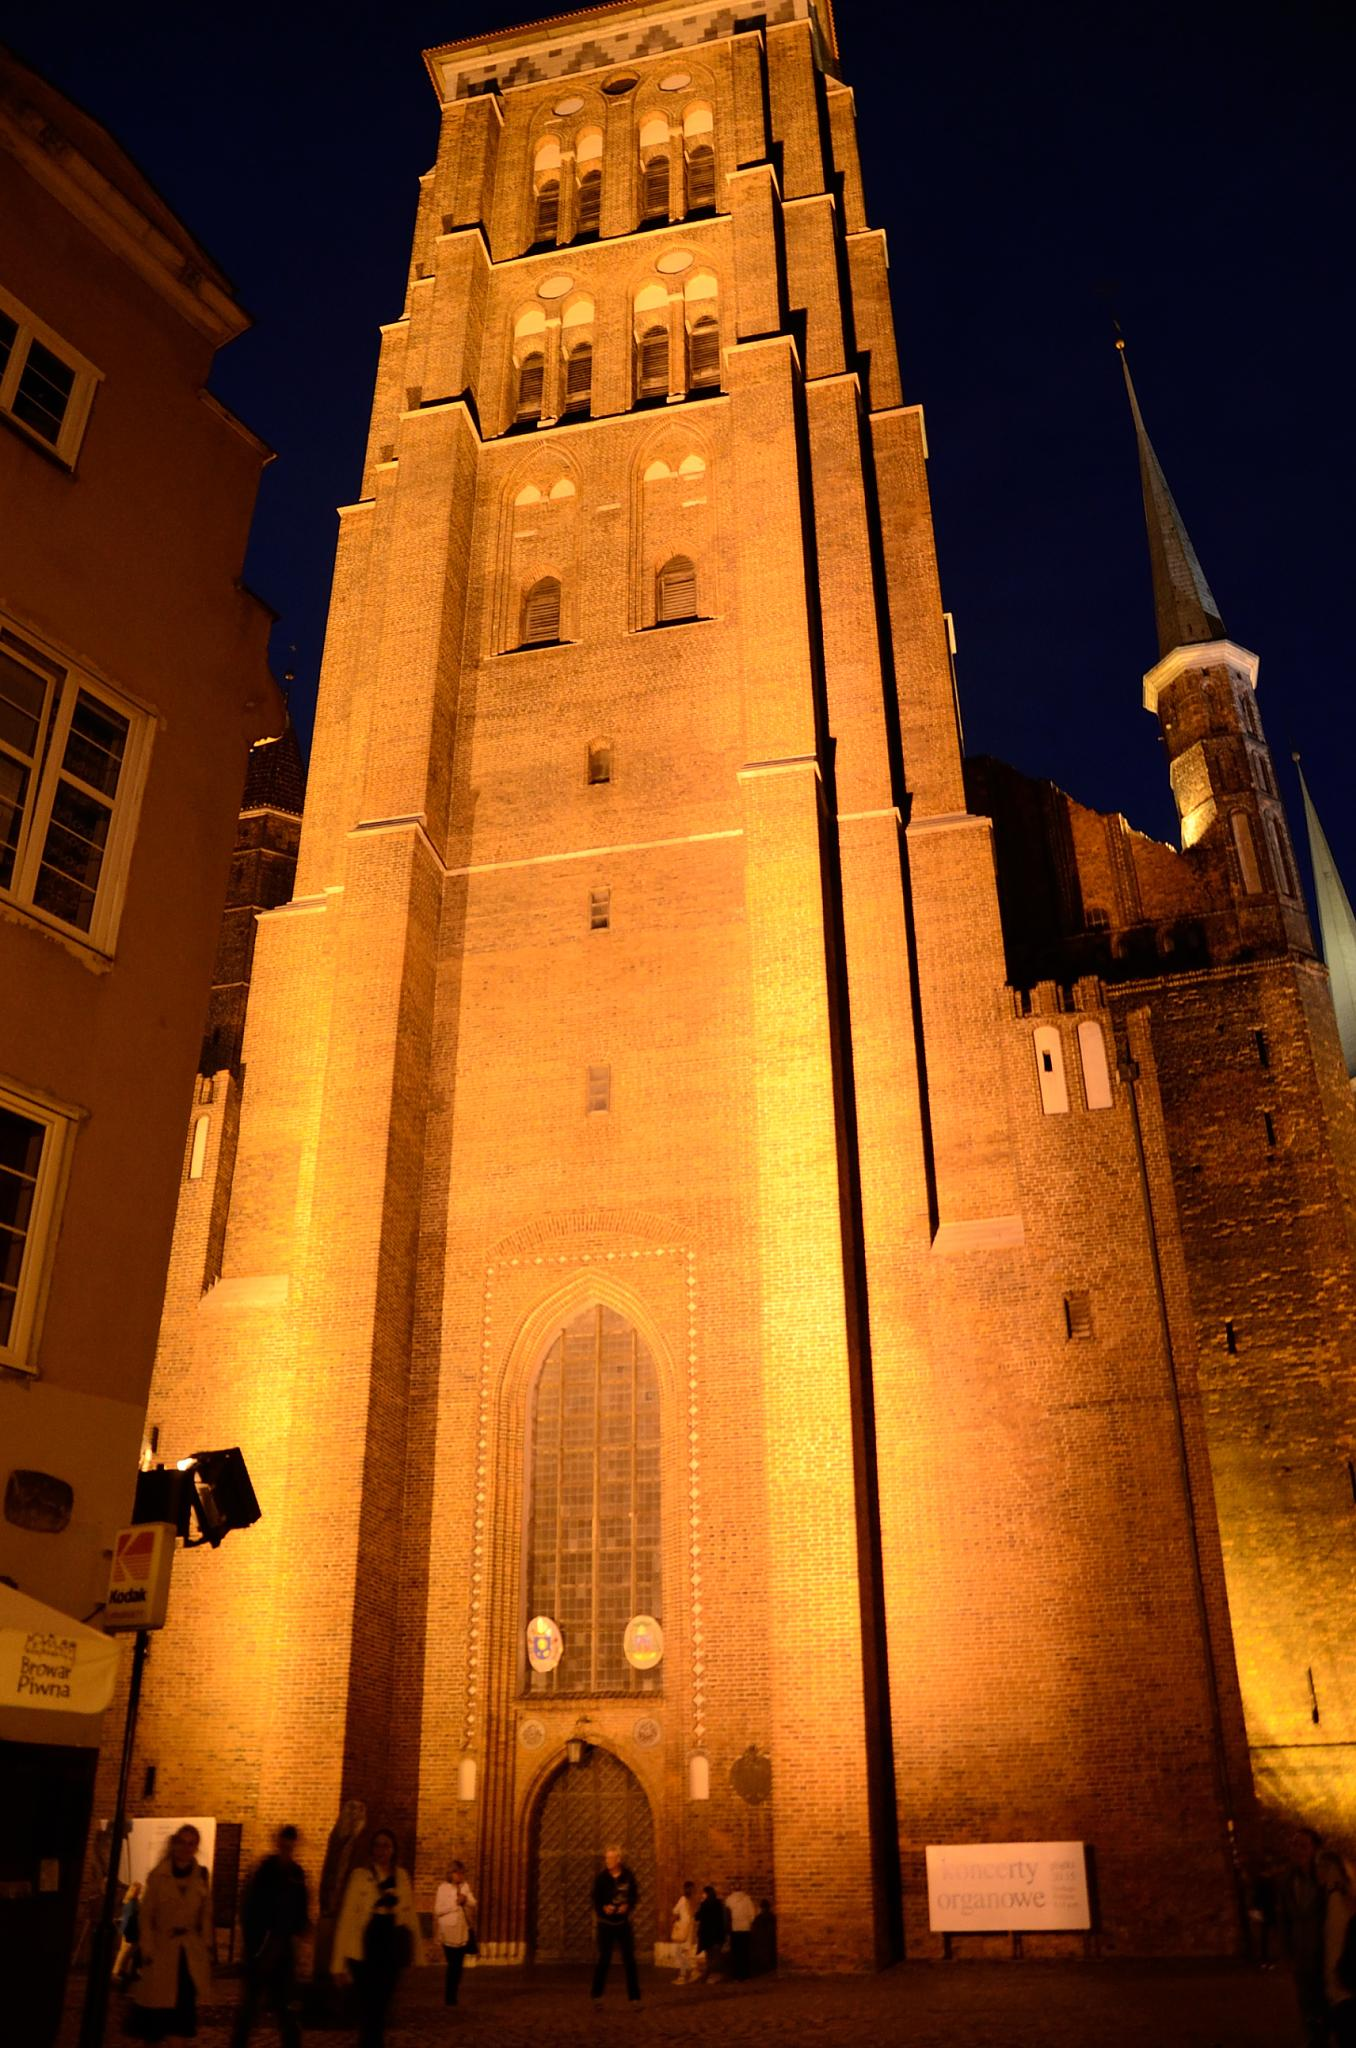 Gdańsk - the St. Mary's Basilica by habibi27